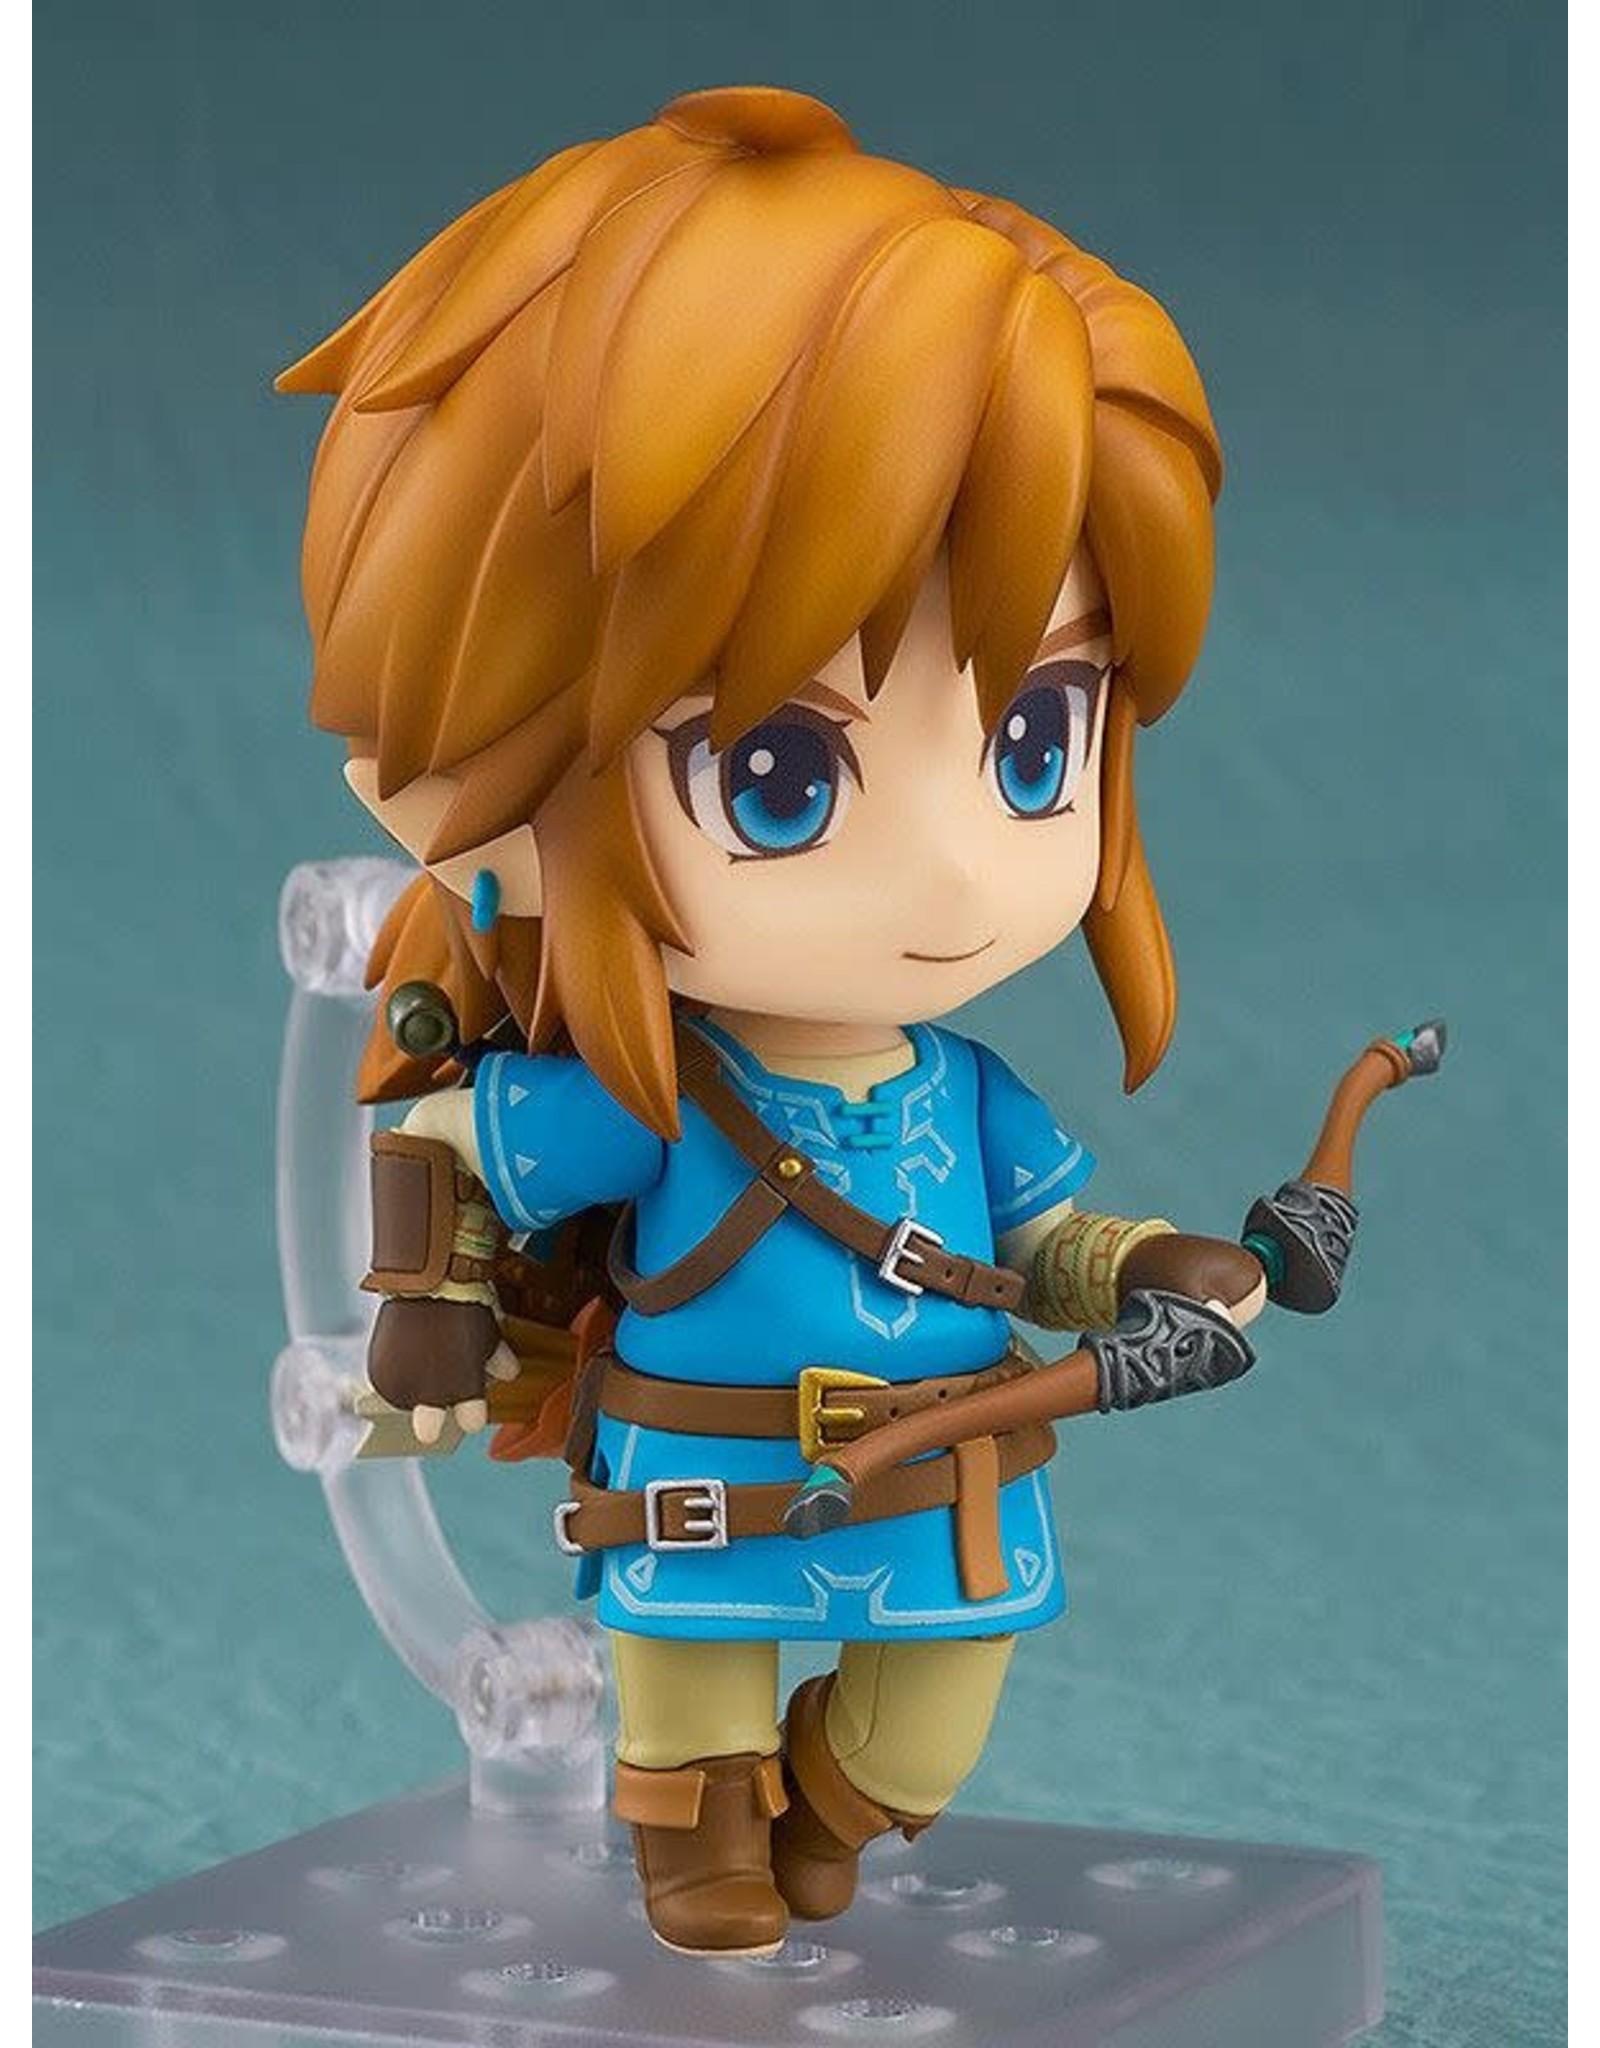 The Legend of Zelda: Breath of the Wild - Link - Nendoroid 0733